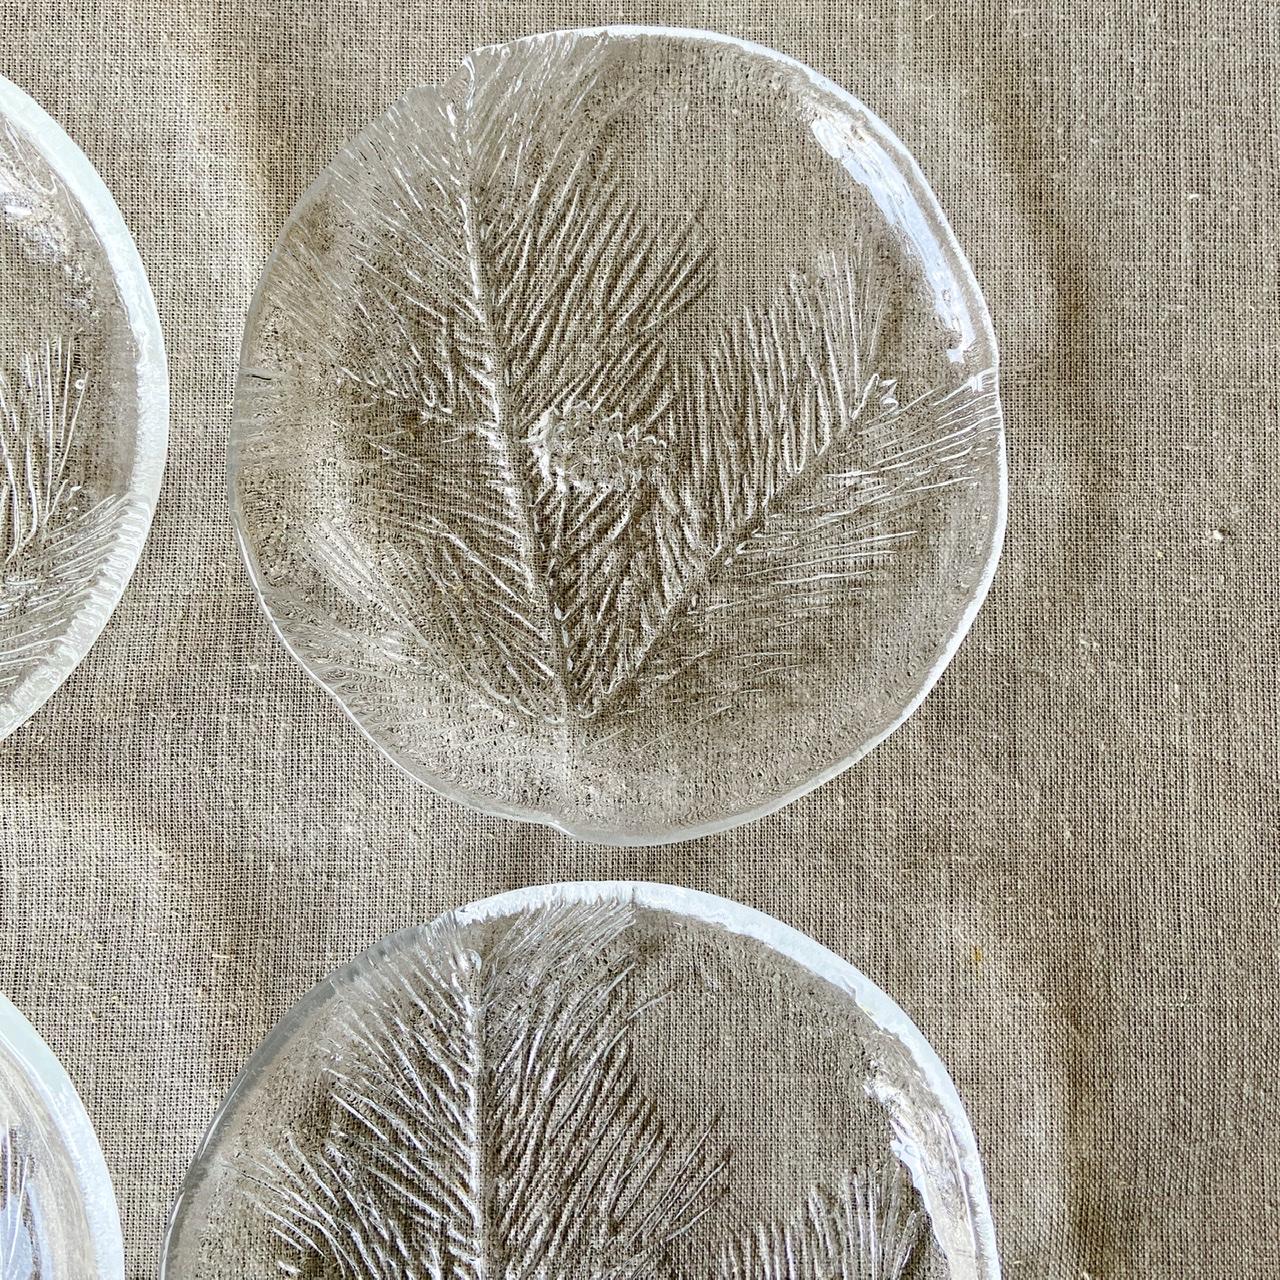 Glasassietter, set om fyra